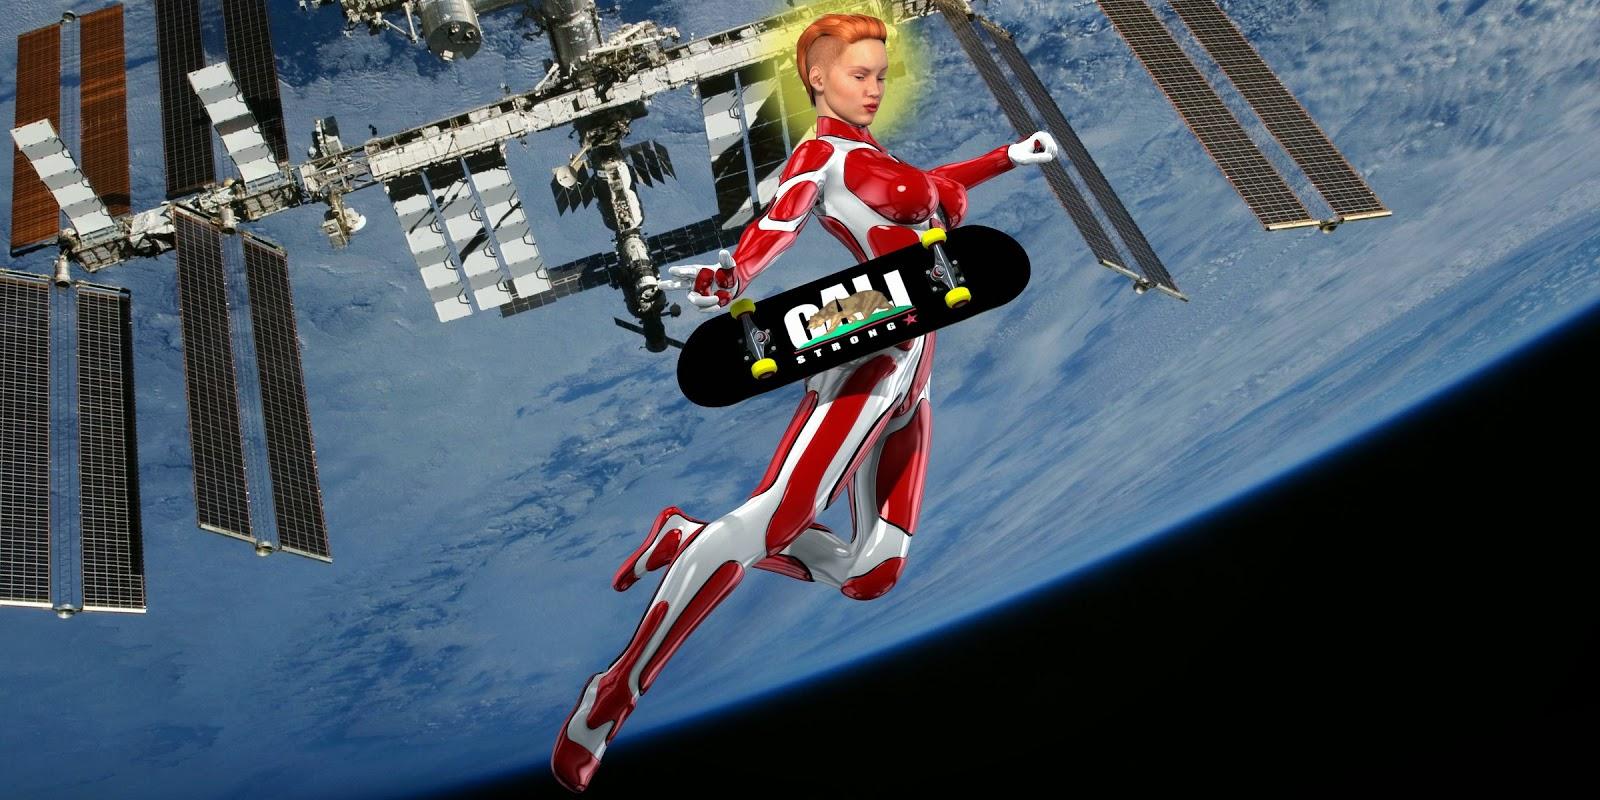 CALI Strong Original Skateboard Trick Complete